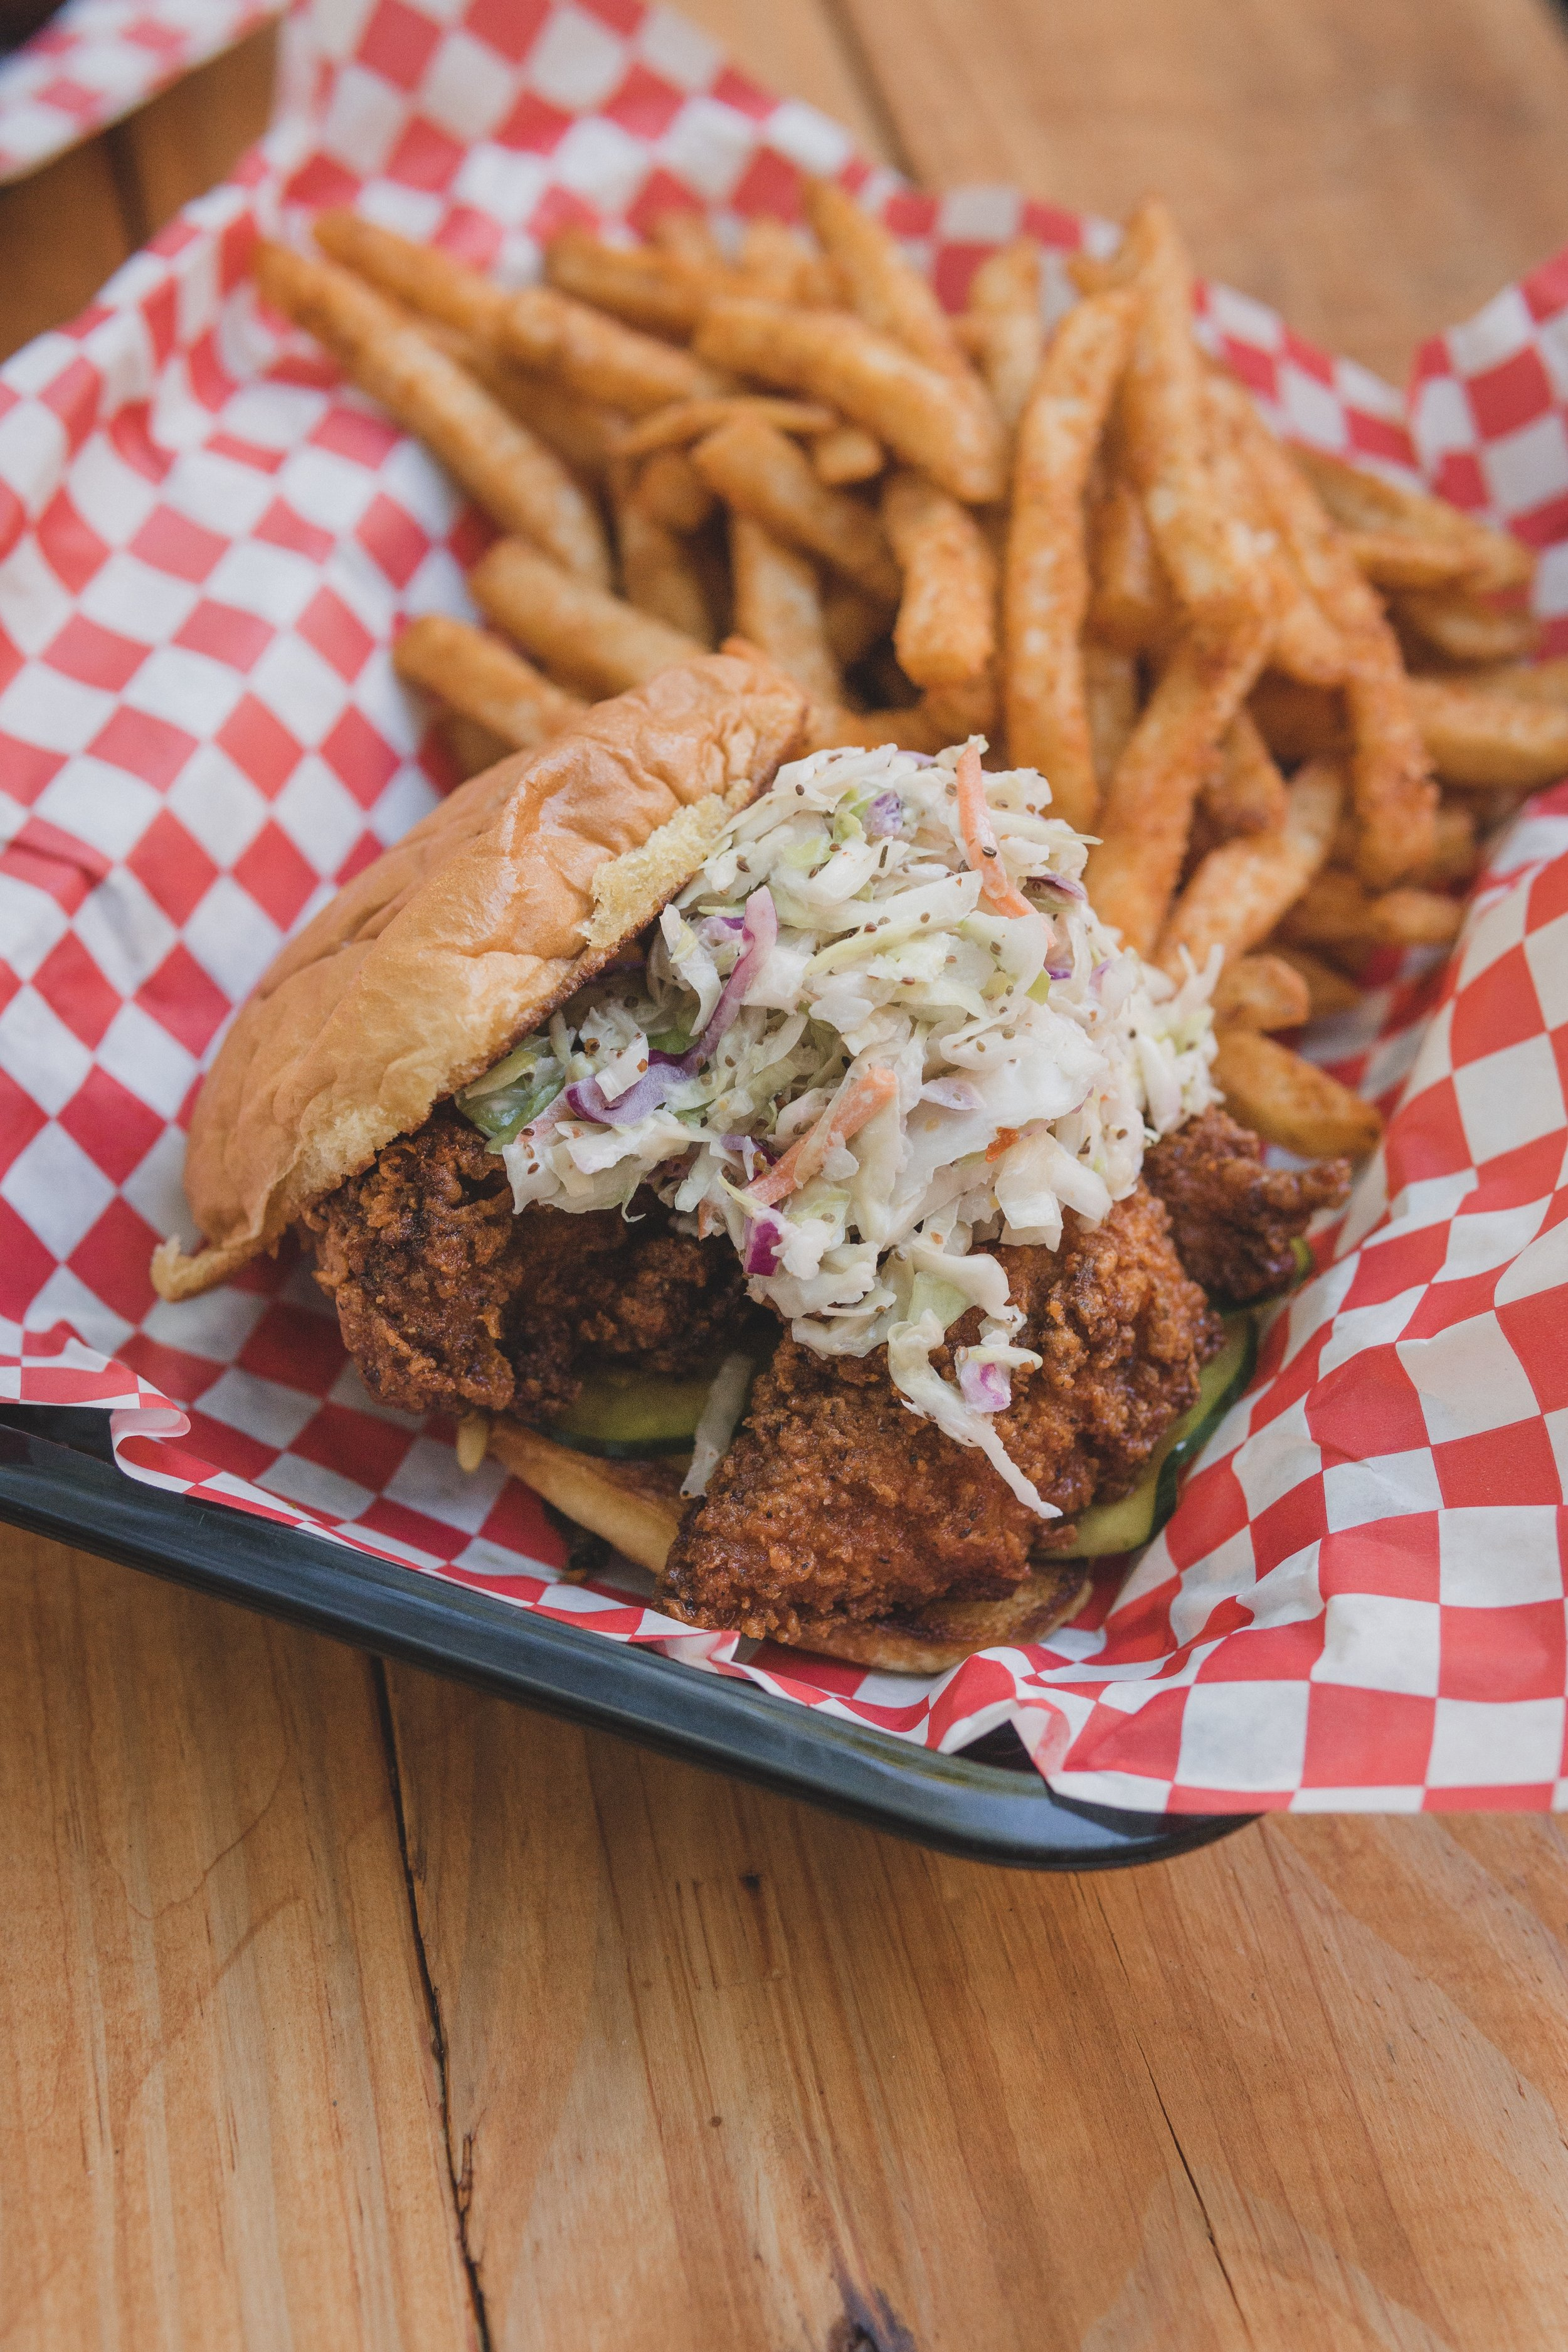 Nashville Hot Sandwich: 2 Nashville Hot tenders, sweet heat pickles, shredded slaw on a toasted bun